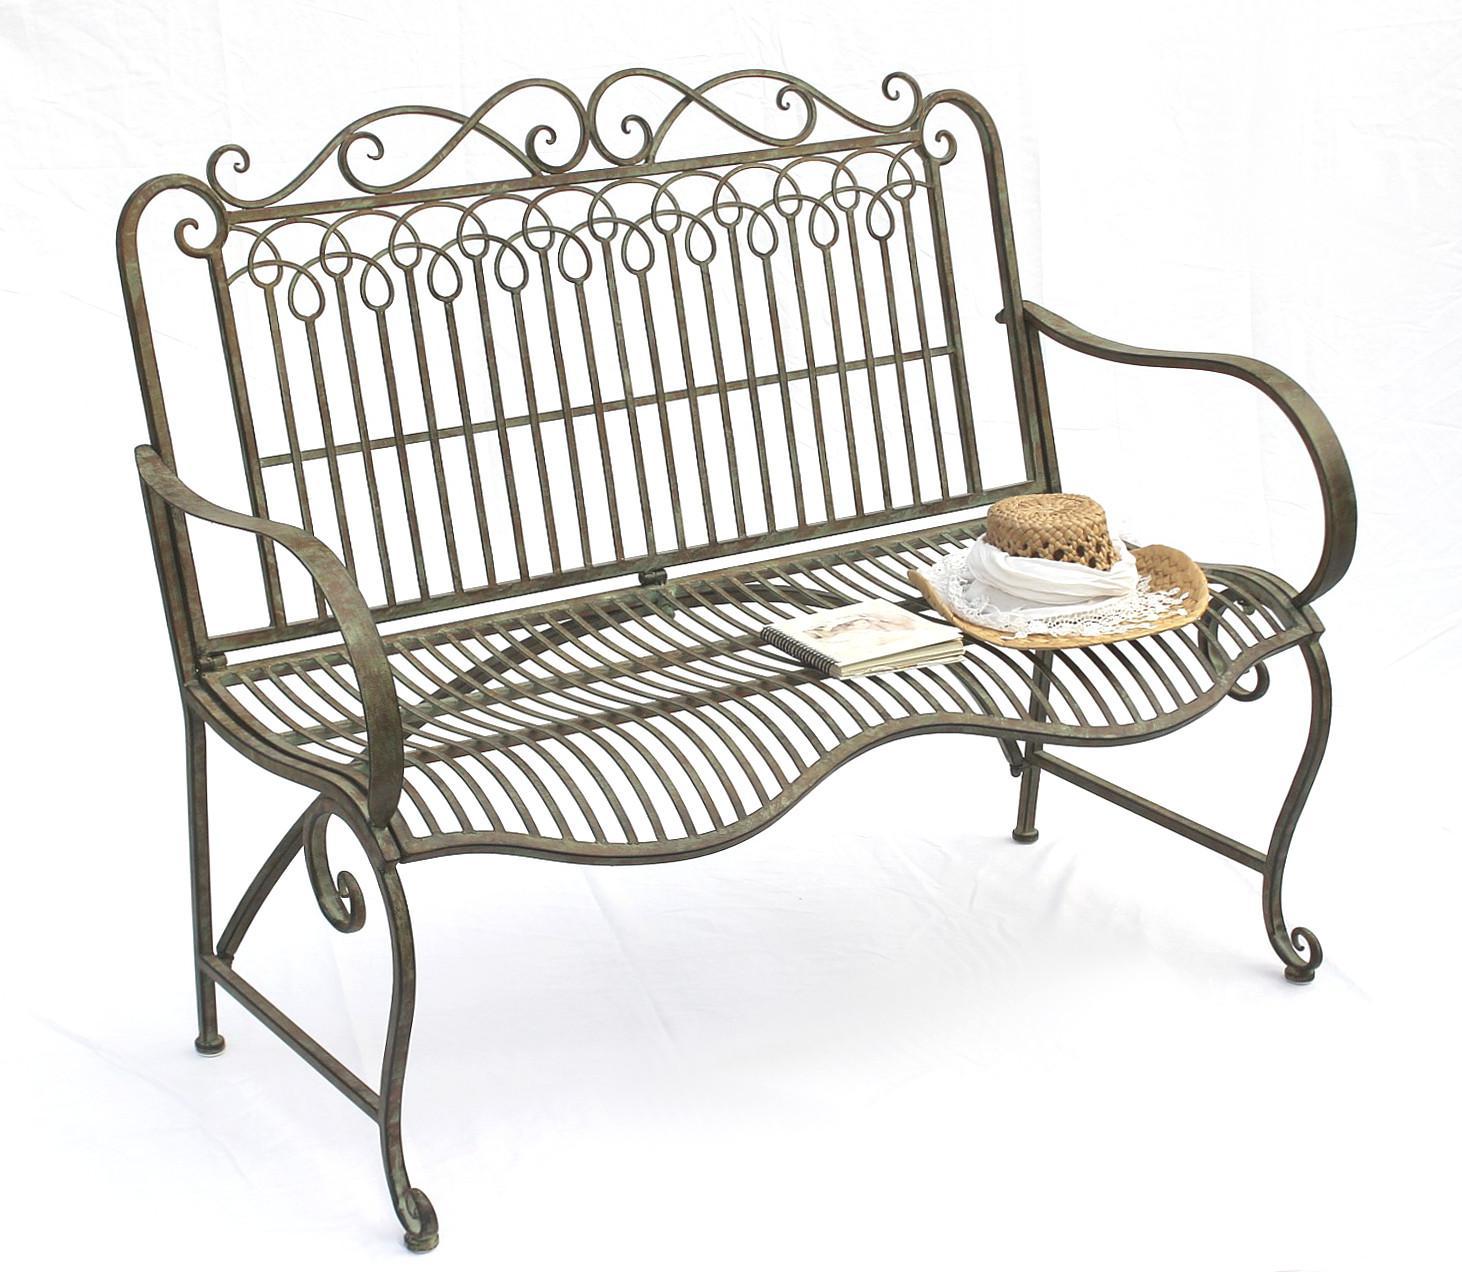 bank aus metall gartenbank jc150014 sitzbank parkbank 2 sitzer 110cm patina gr n kaufen bei. Black Bedroom Furniture Sets. Home Design Ideas